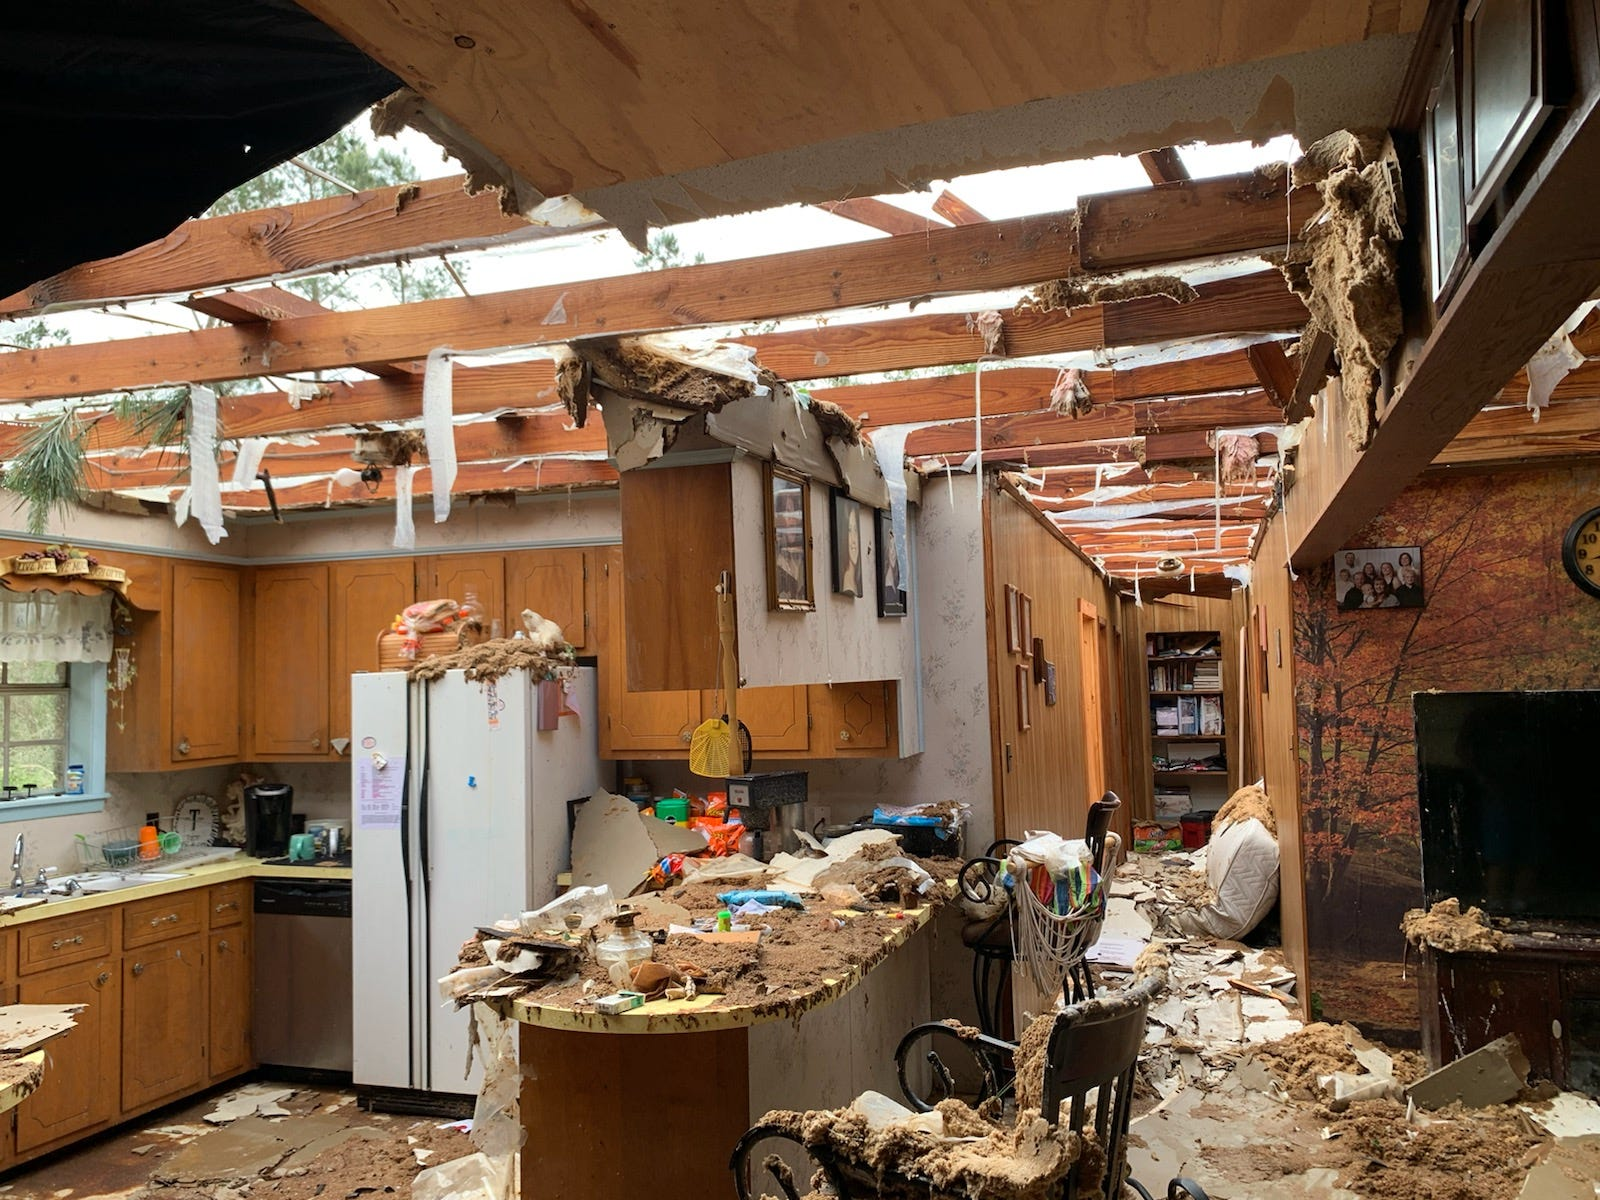 storm_disaster__servpro_of_west_pensacola_1101_s._fairfield_dr_pensacola__fl._32506_850-469-1160_https-::g.page:servproofwestpensacola?share.jpg